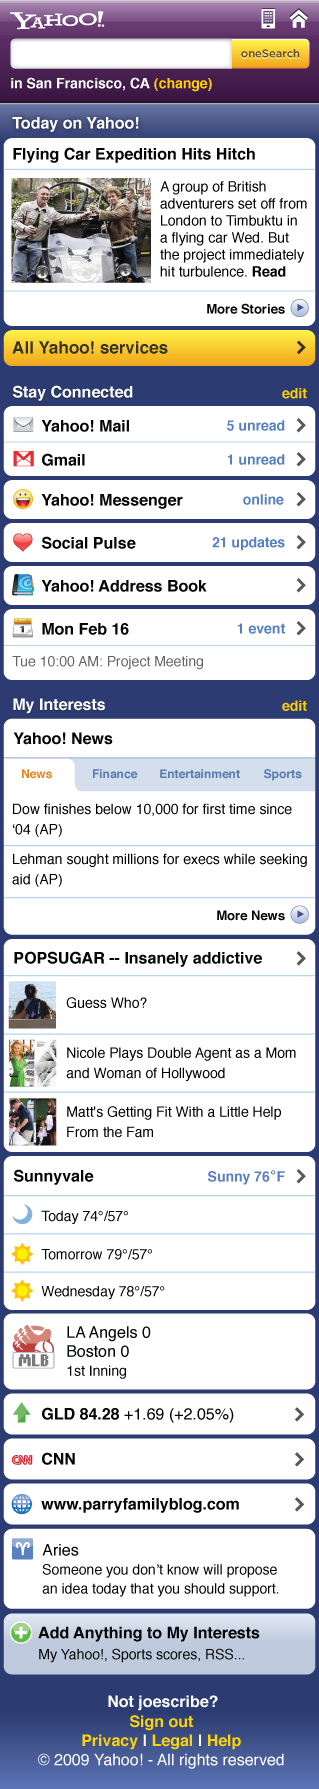 yahoo_mobileweb_news.jpg